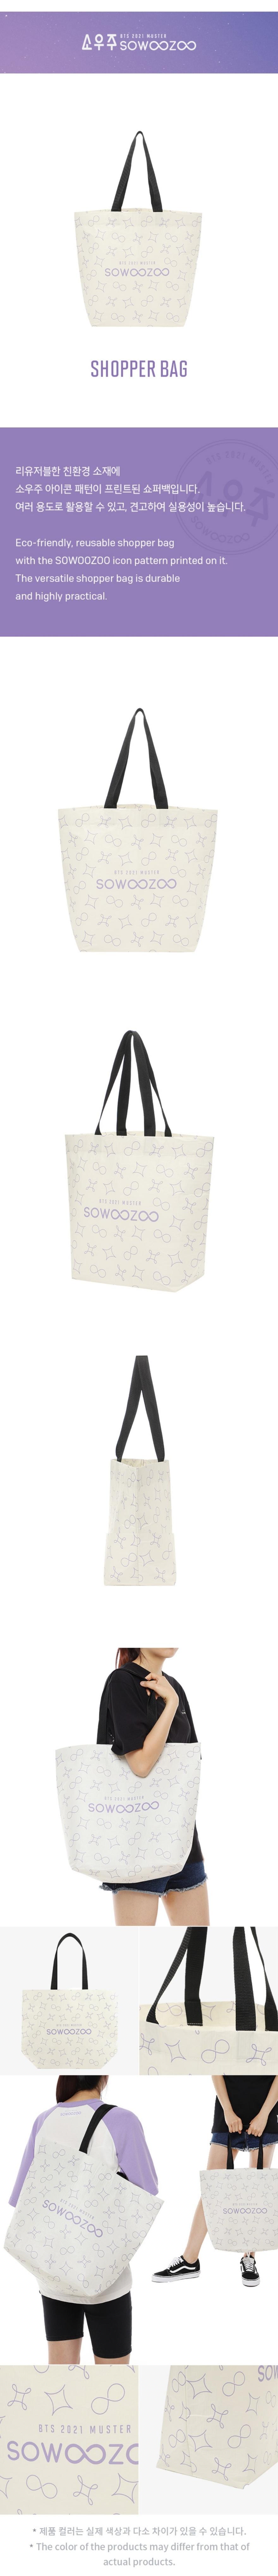 BTS SoWooZoo Shopper Bag ivory